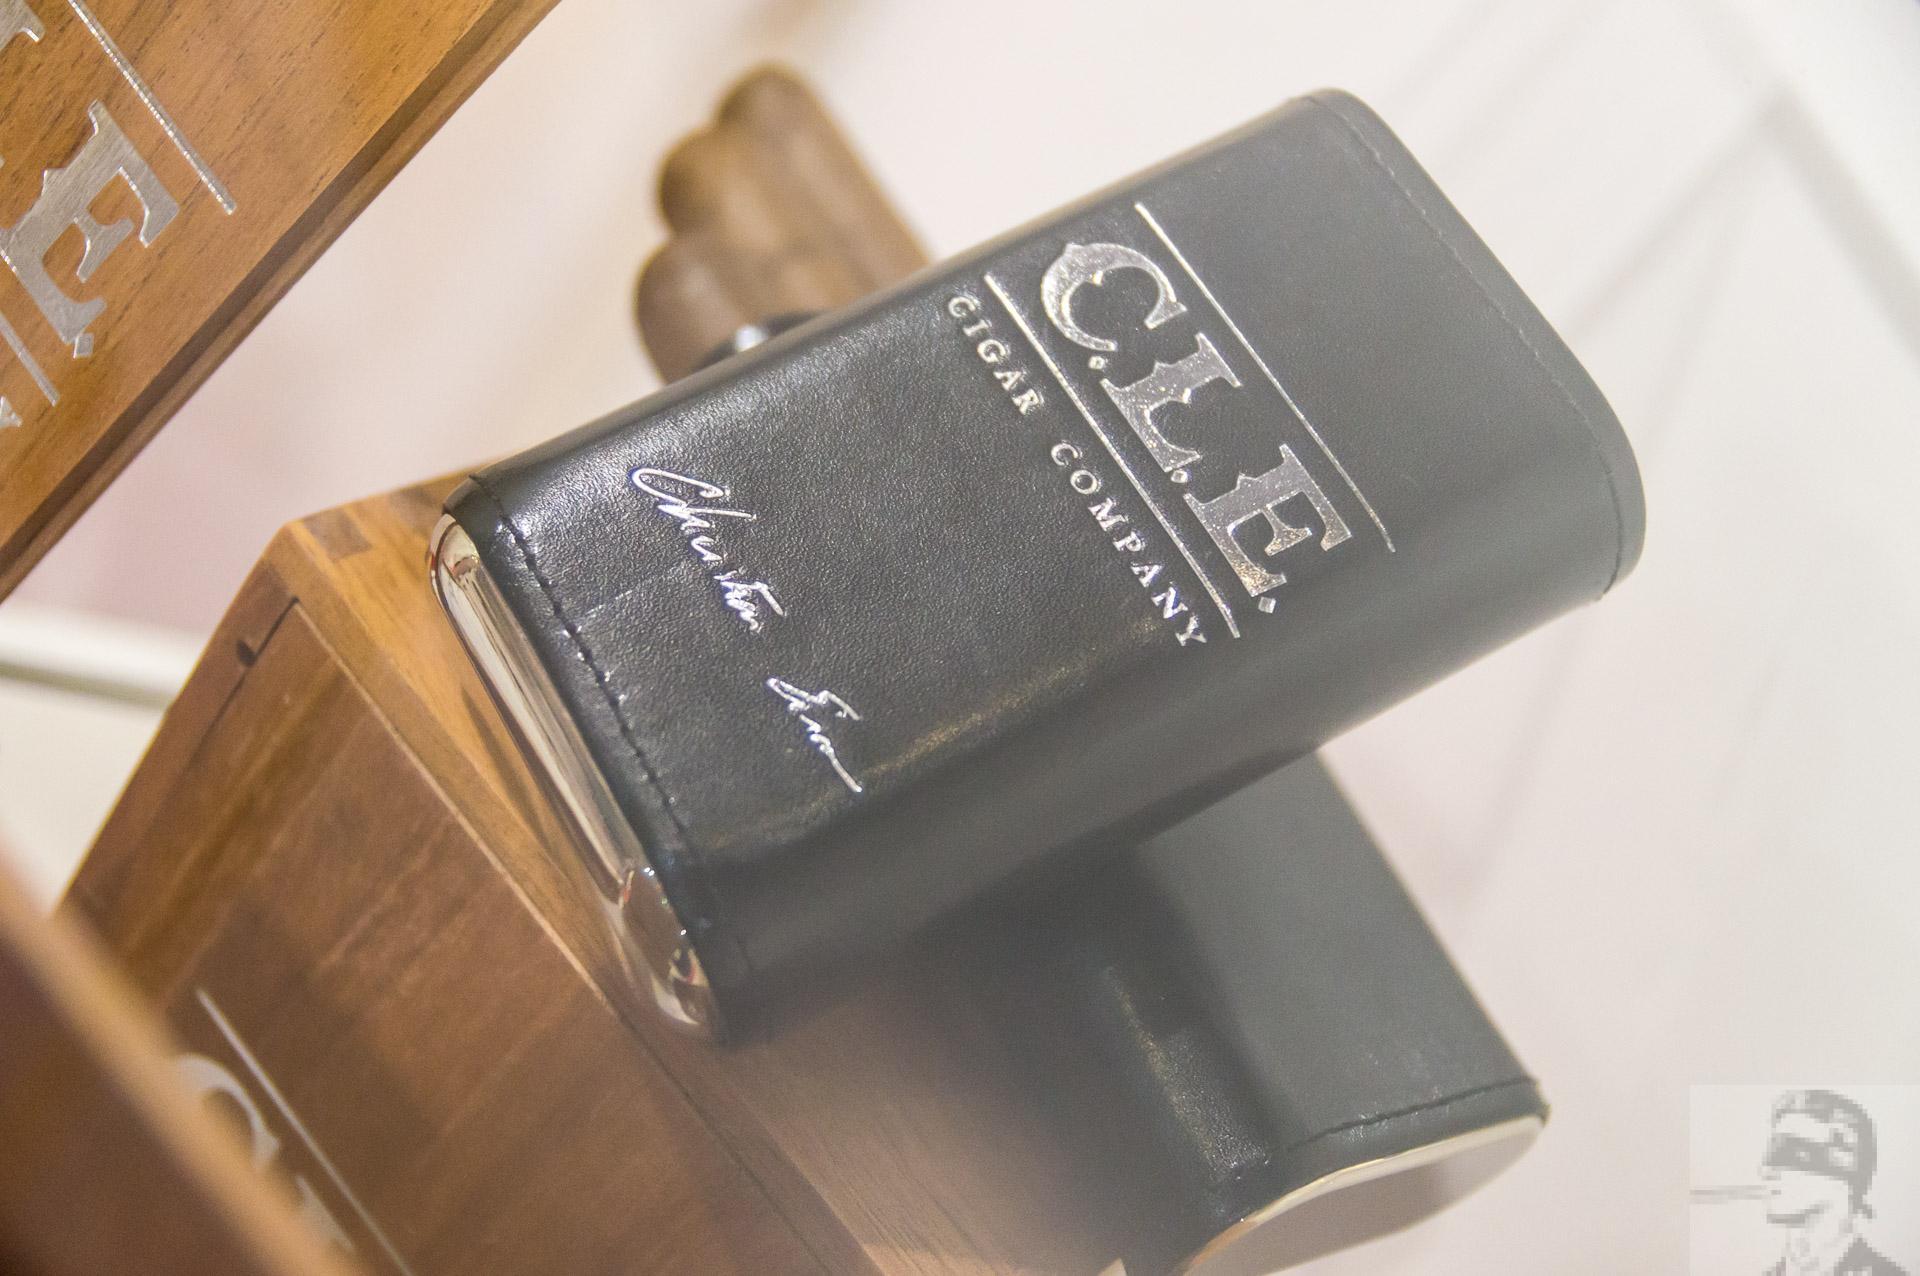 C.L.E. branded cigar cases